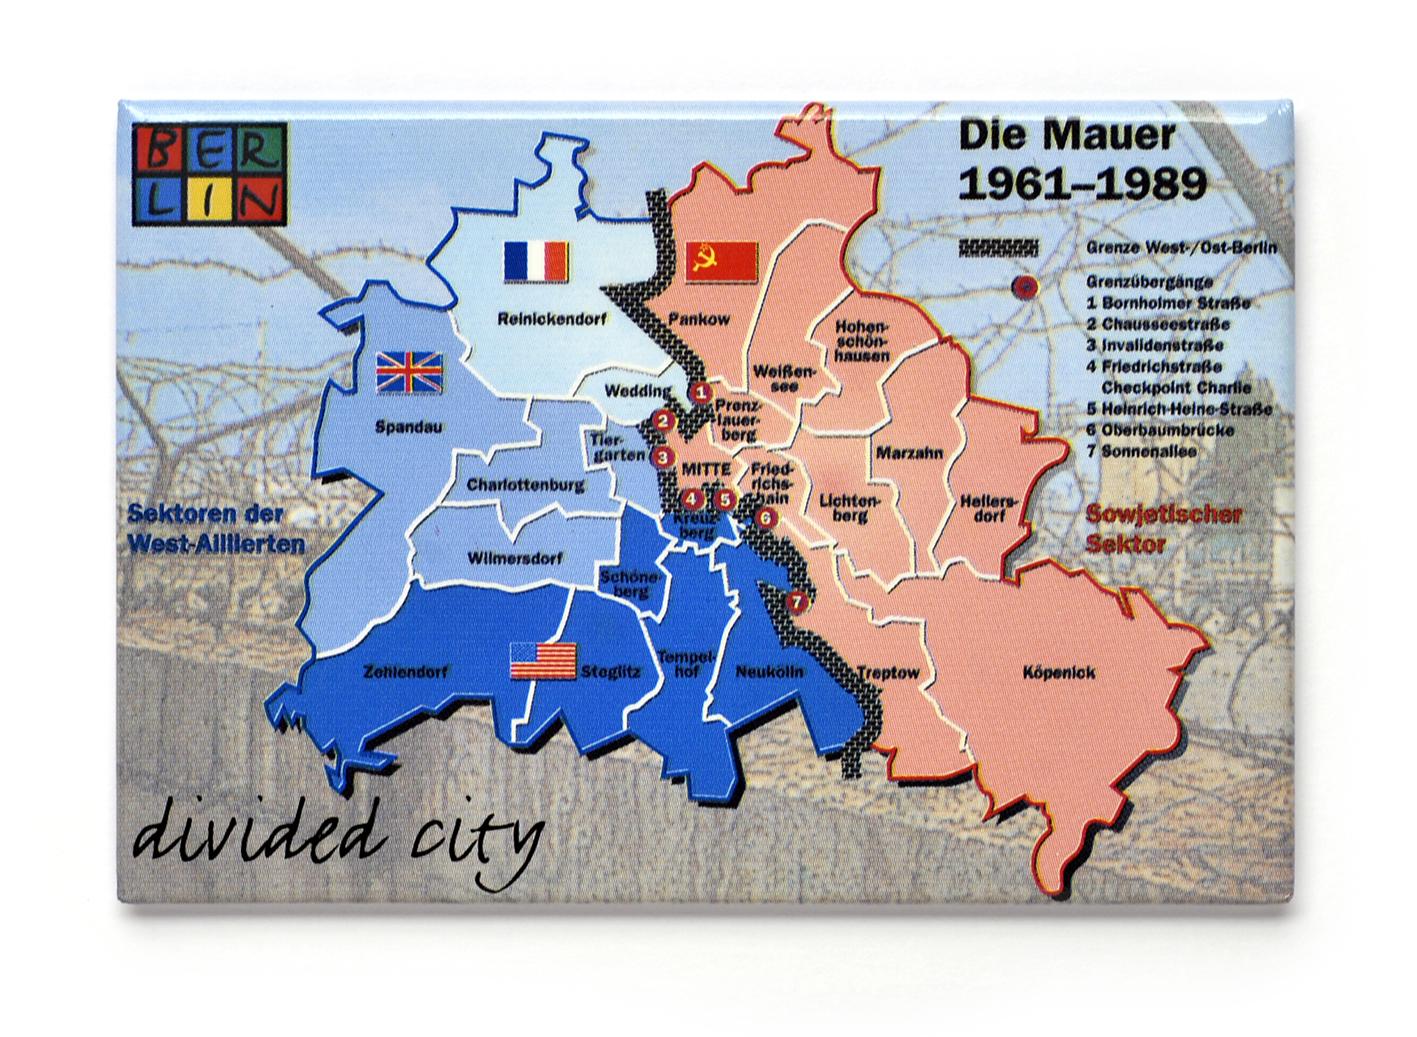 050-0032 Magnet, Divided City